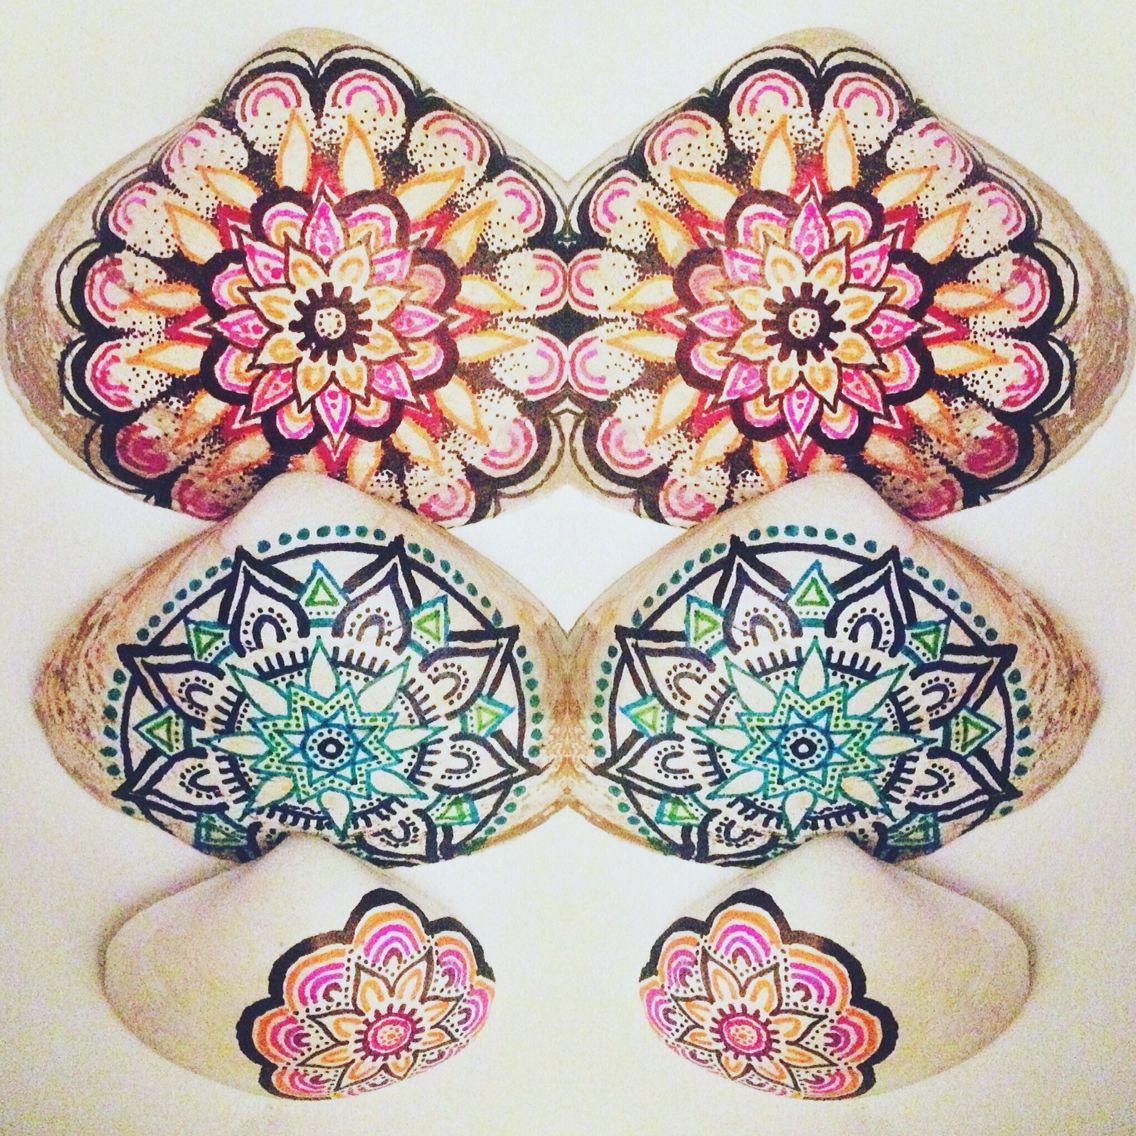 Hand Drawn Mandala Seashells by Mandala Minds ⋆ available on etsy soon! 5a8a6253209